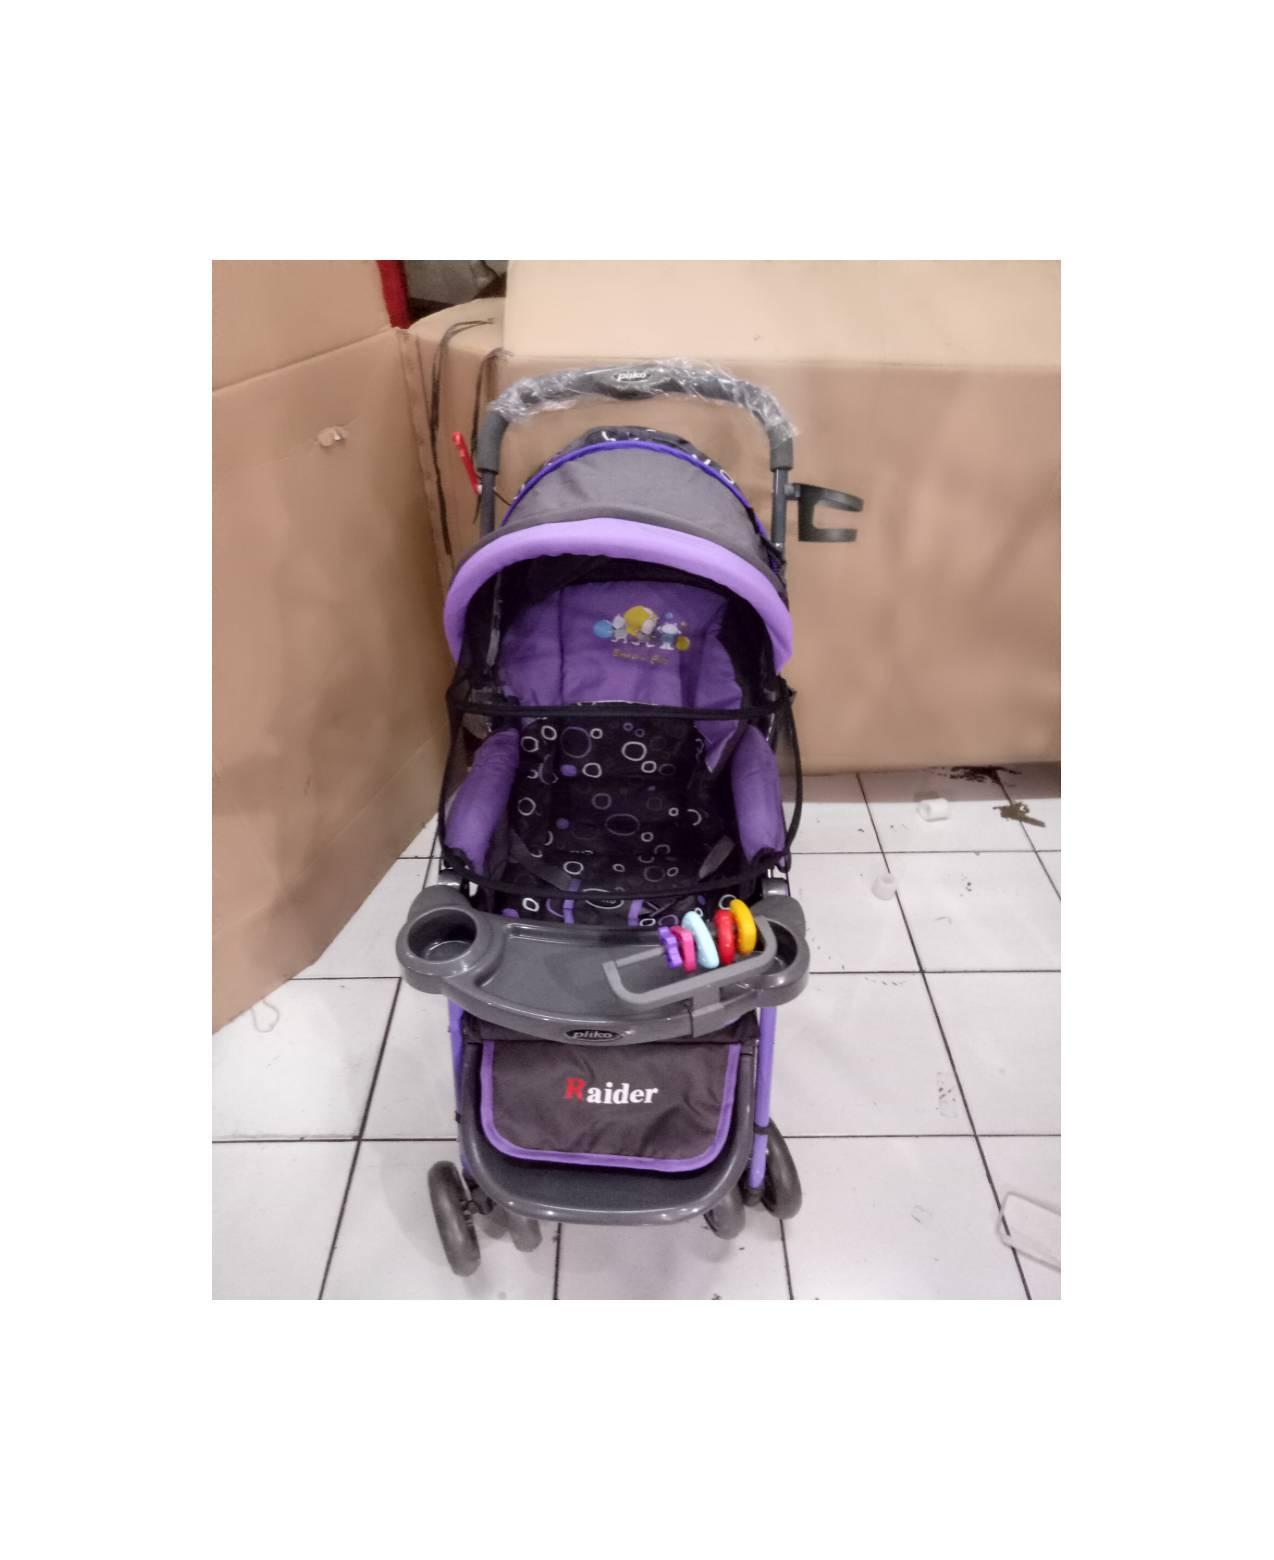 kereta dorongan bayi/baby stroller pliko 228 raider kelambu roda 4